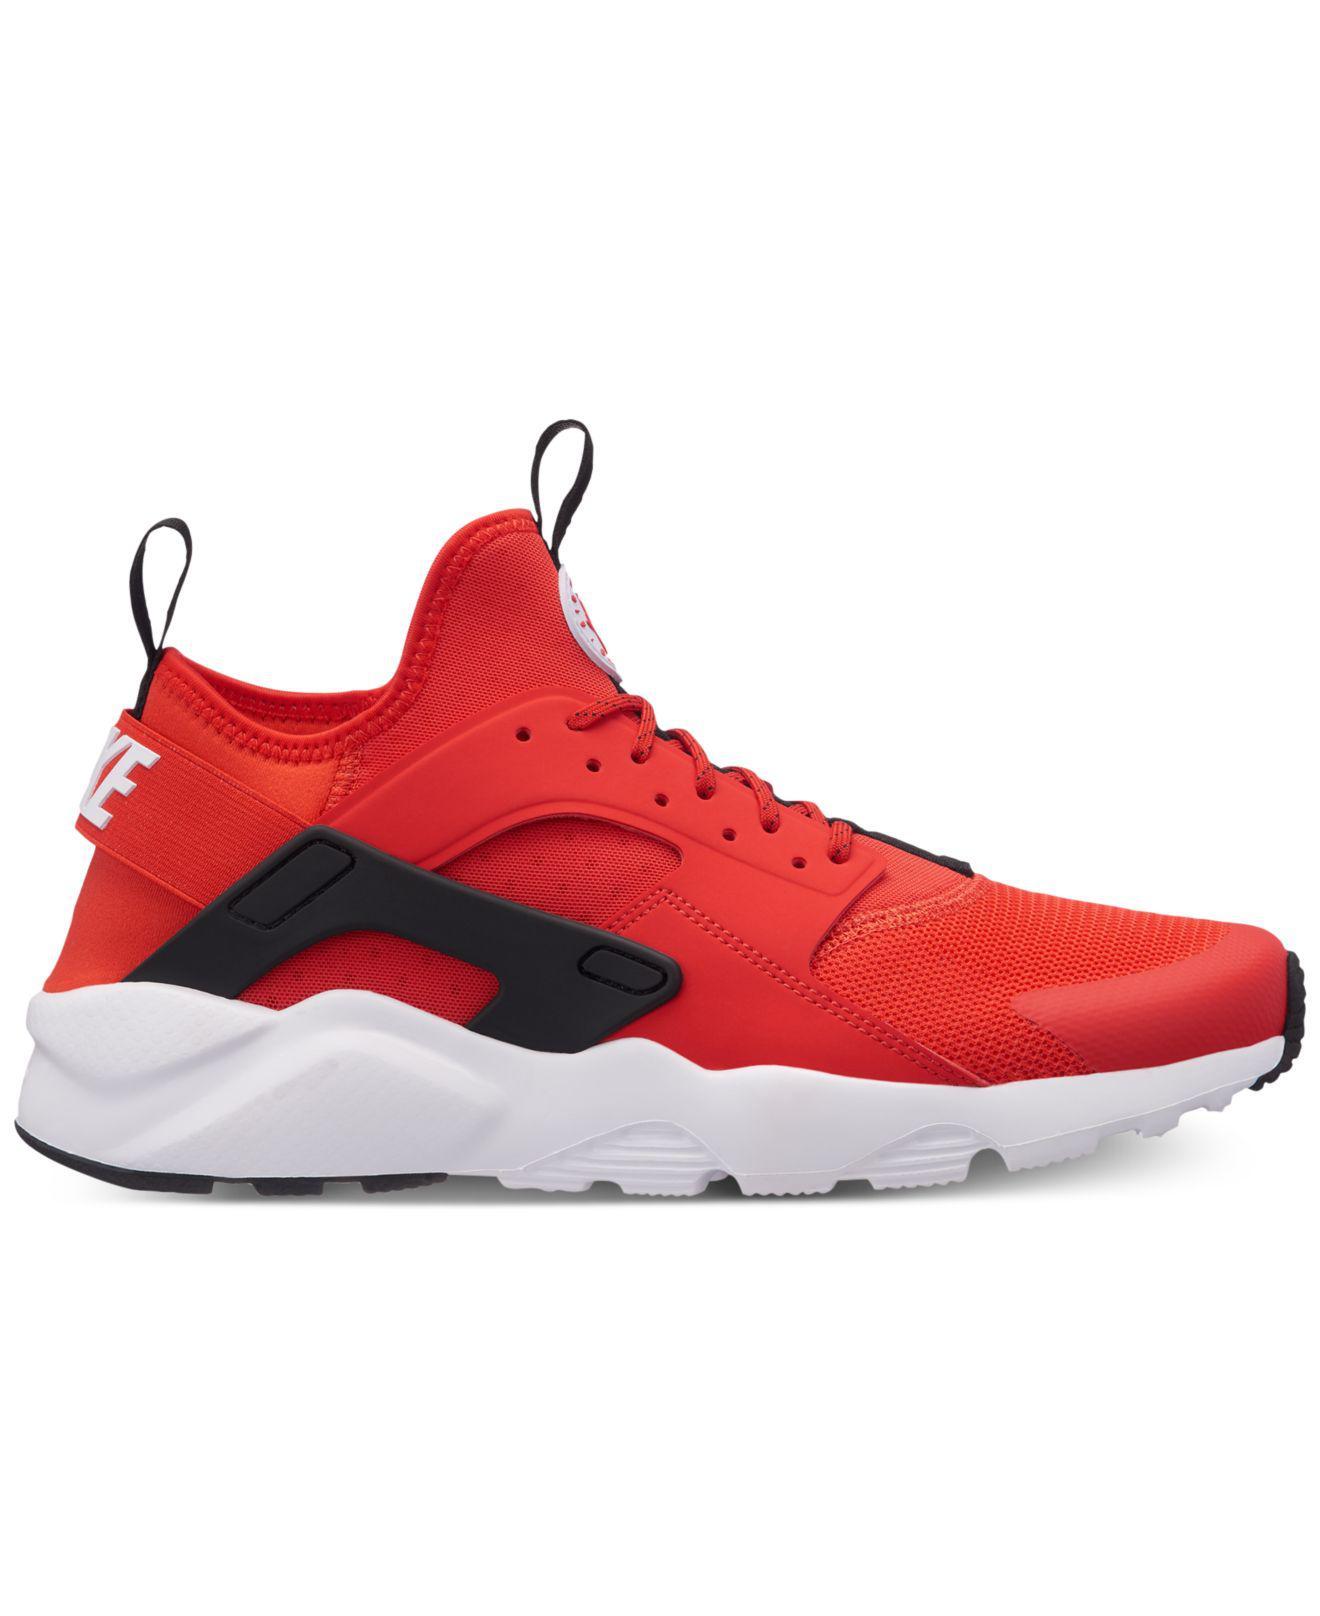 Nike Air Huarache Sneakers Men's Lifestyle Shoes Black/White